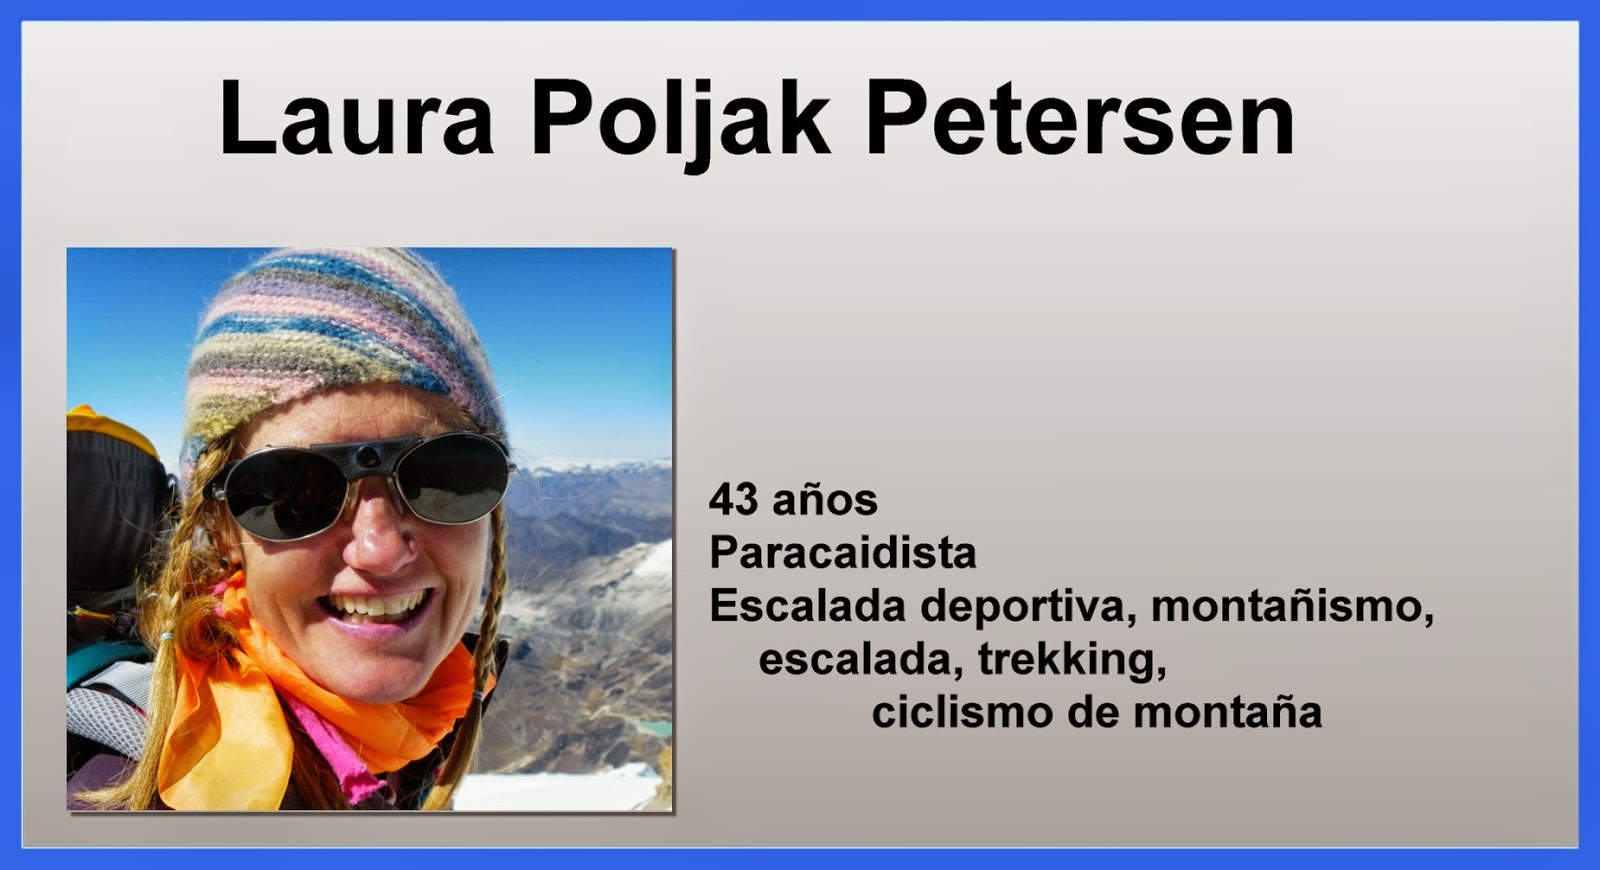 https://www.facebook.com/laura.poljak.5?fref=ts